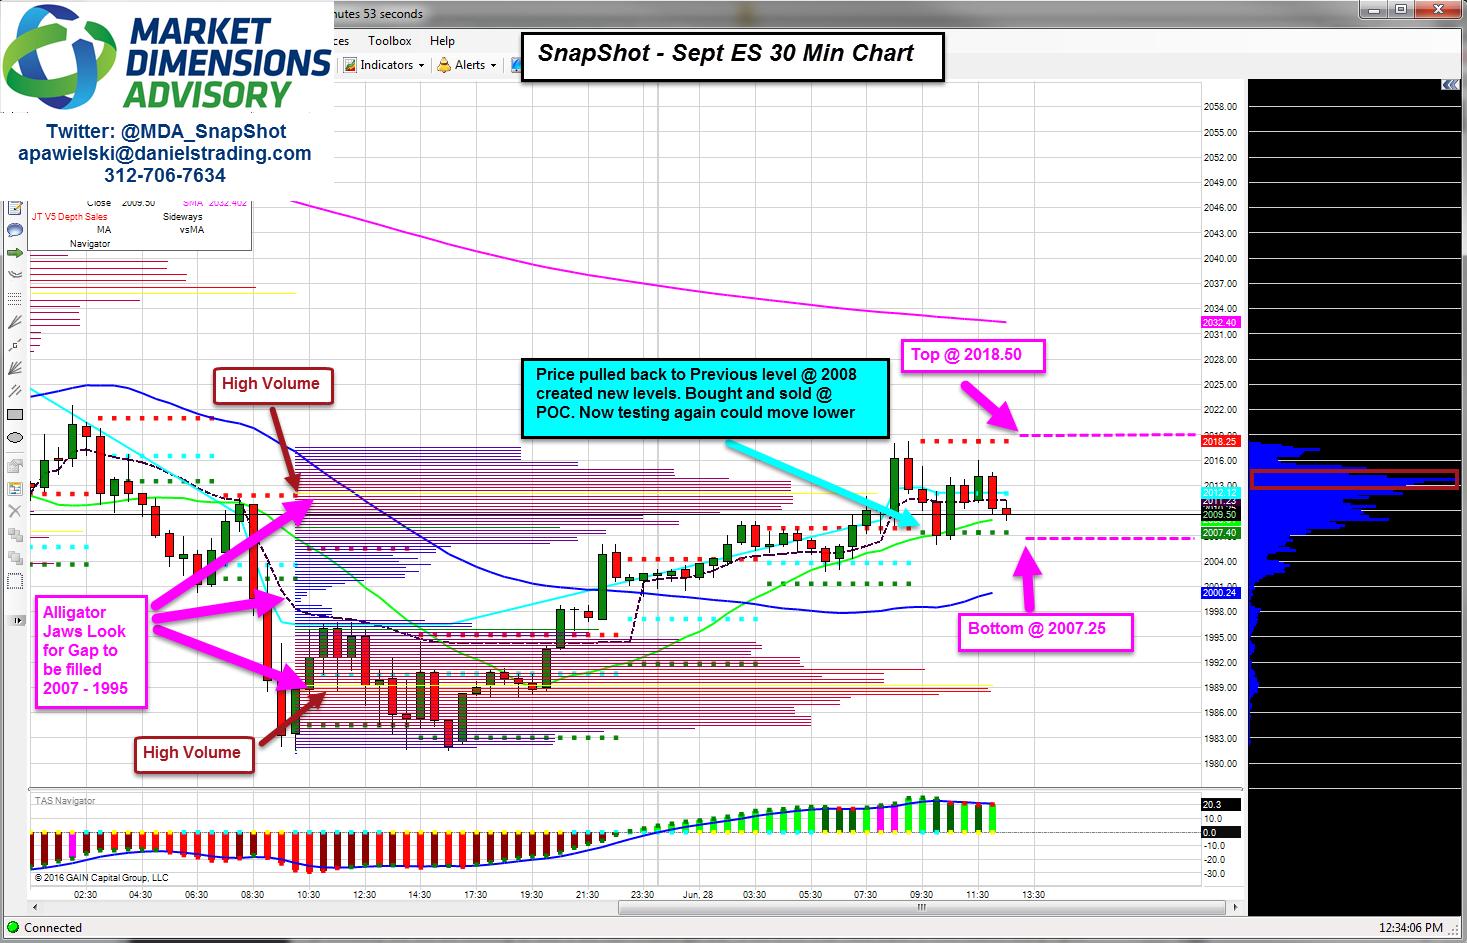 Market Dimensions Advisory: MDA SnapShot ES Levels, 6/28/16 UPDATED